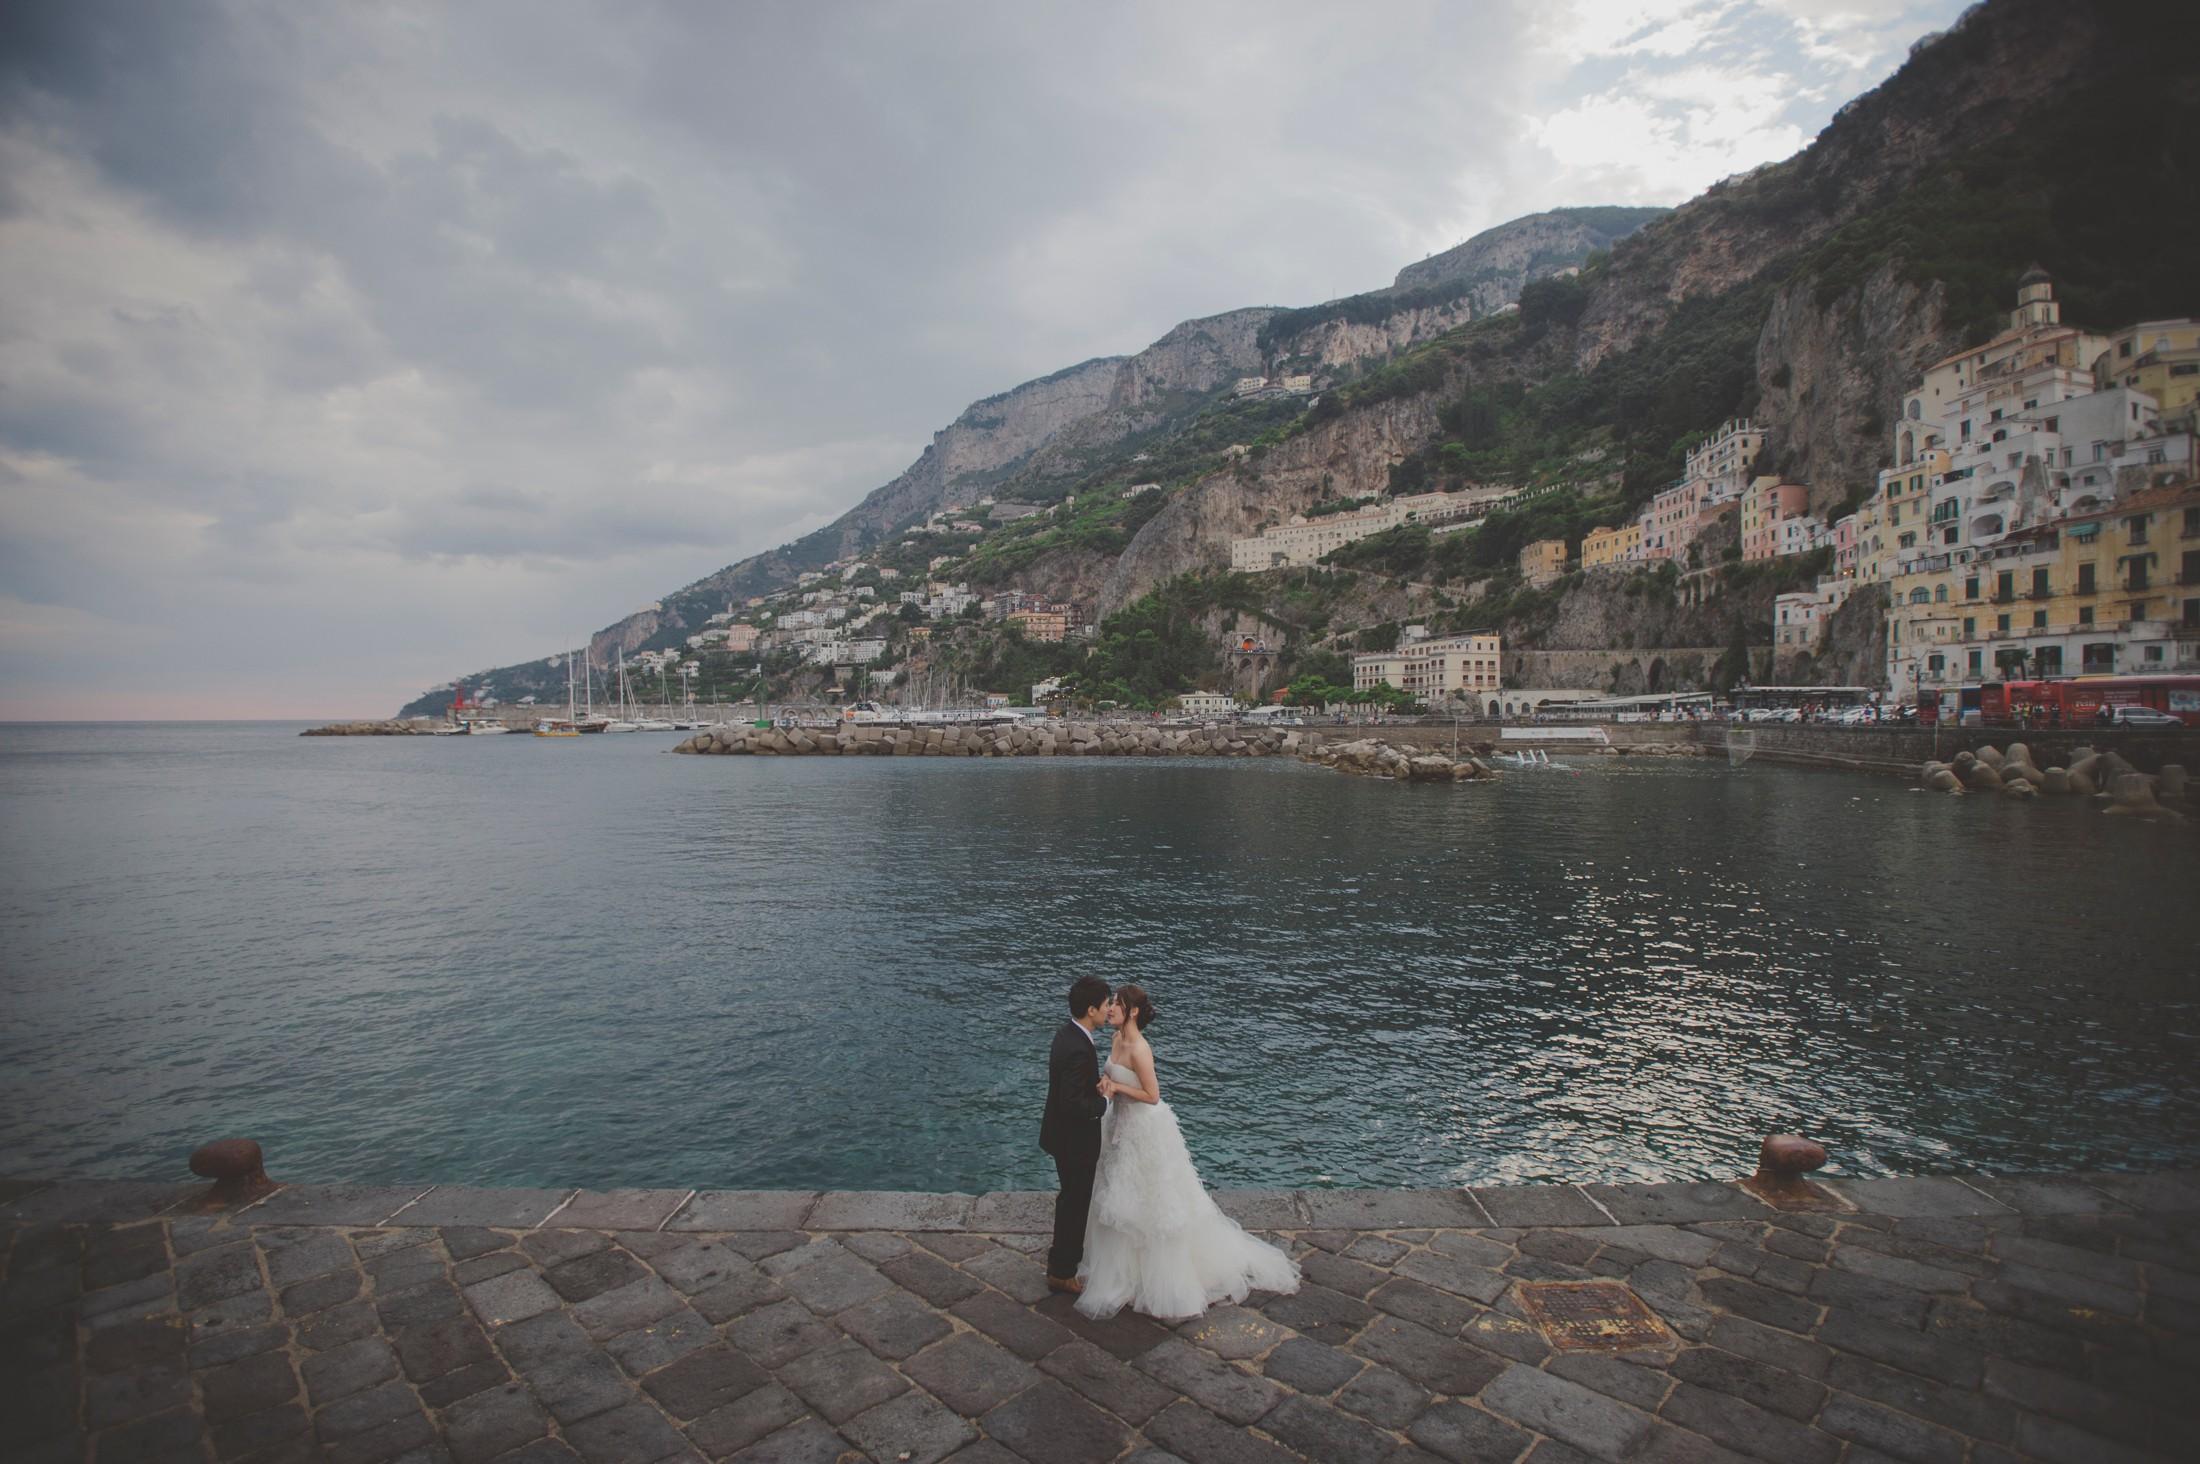 wedding on the amalfi coast bride and groom's portrait by the sea in Amalfi